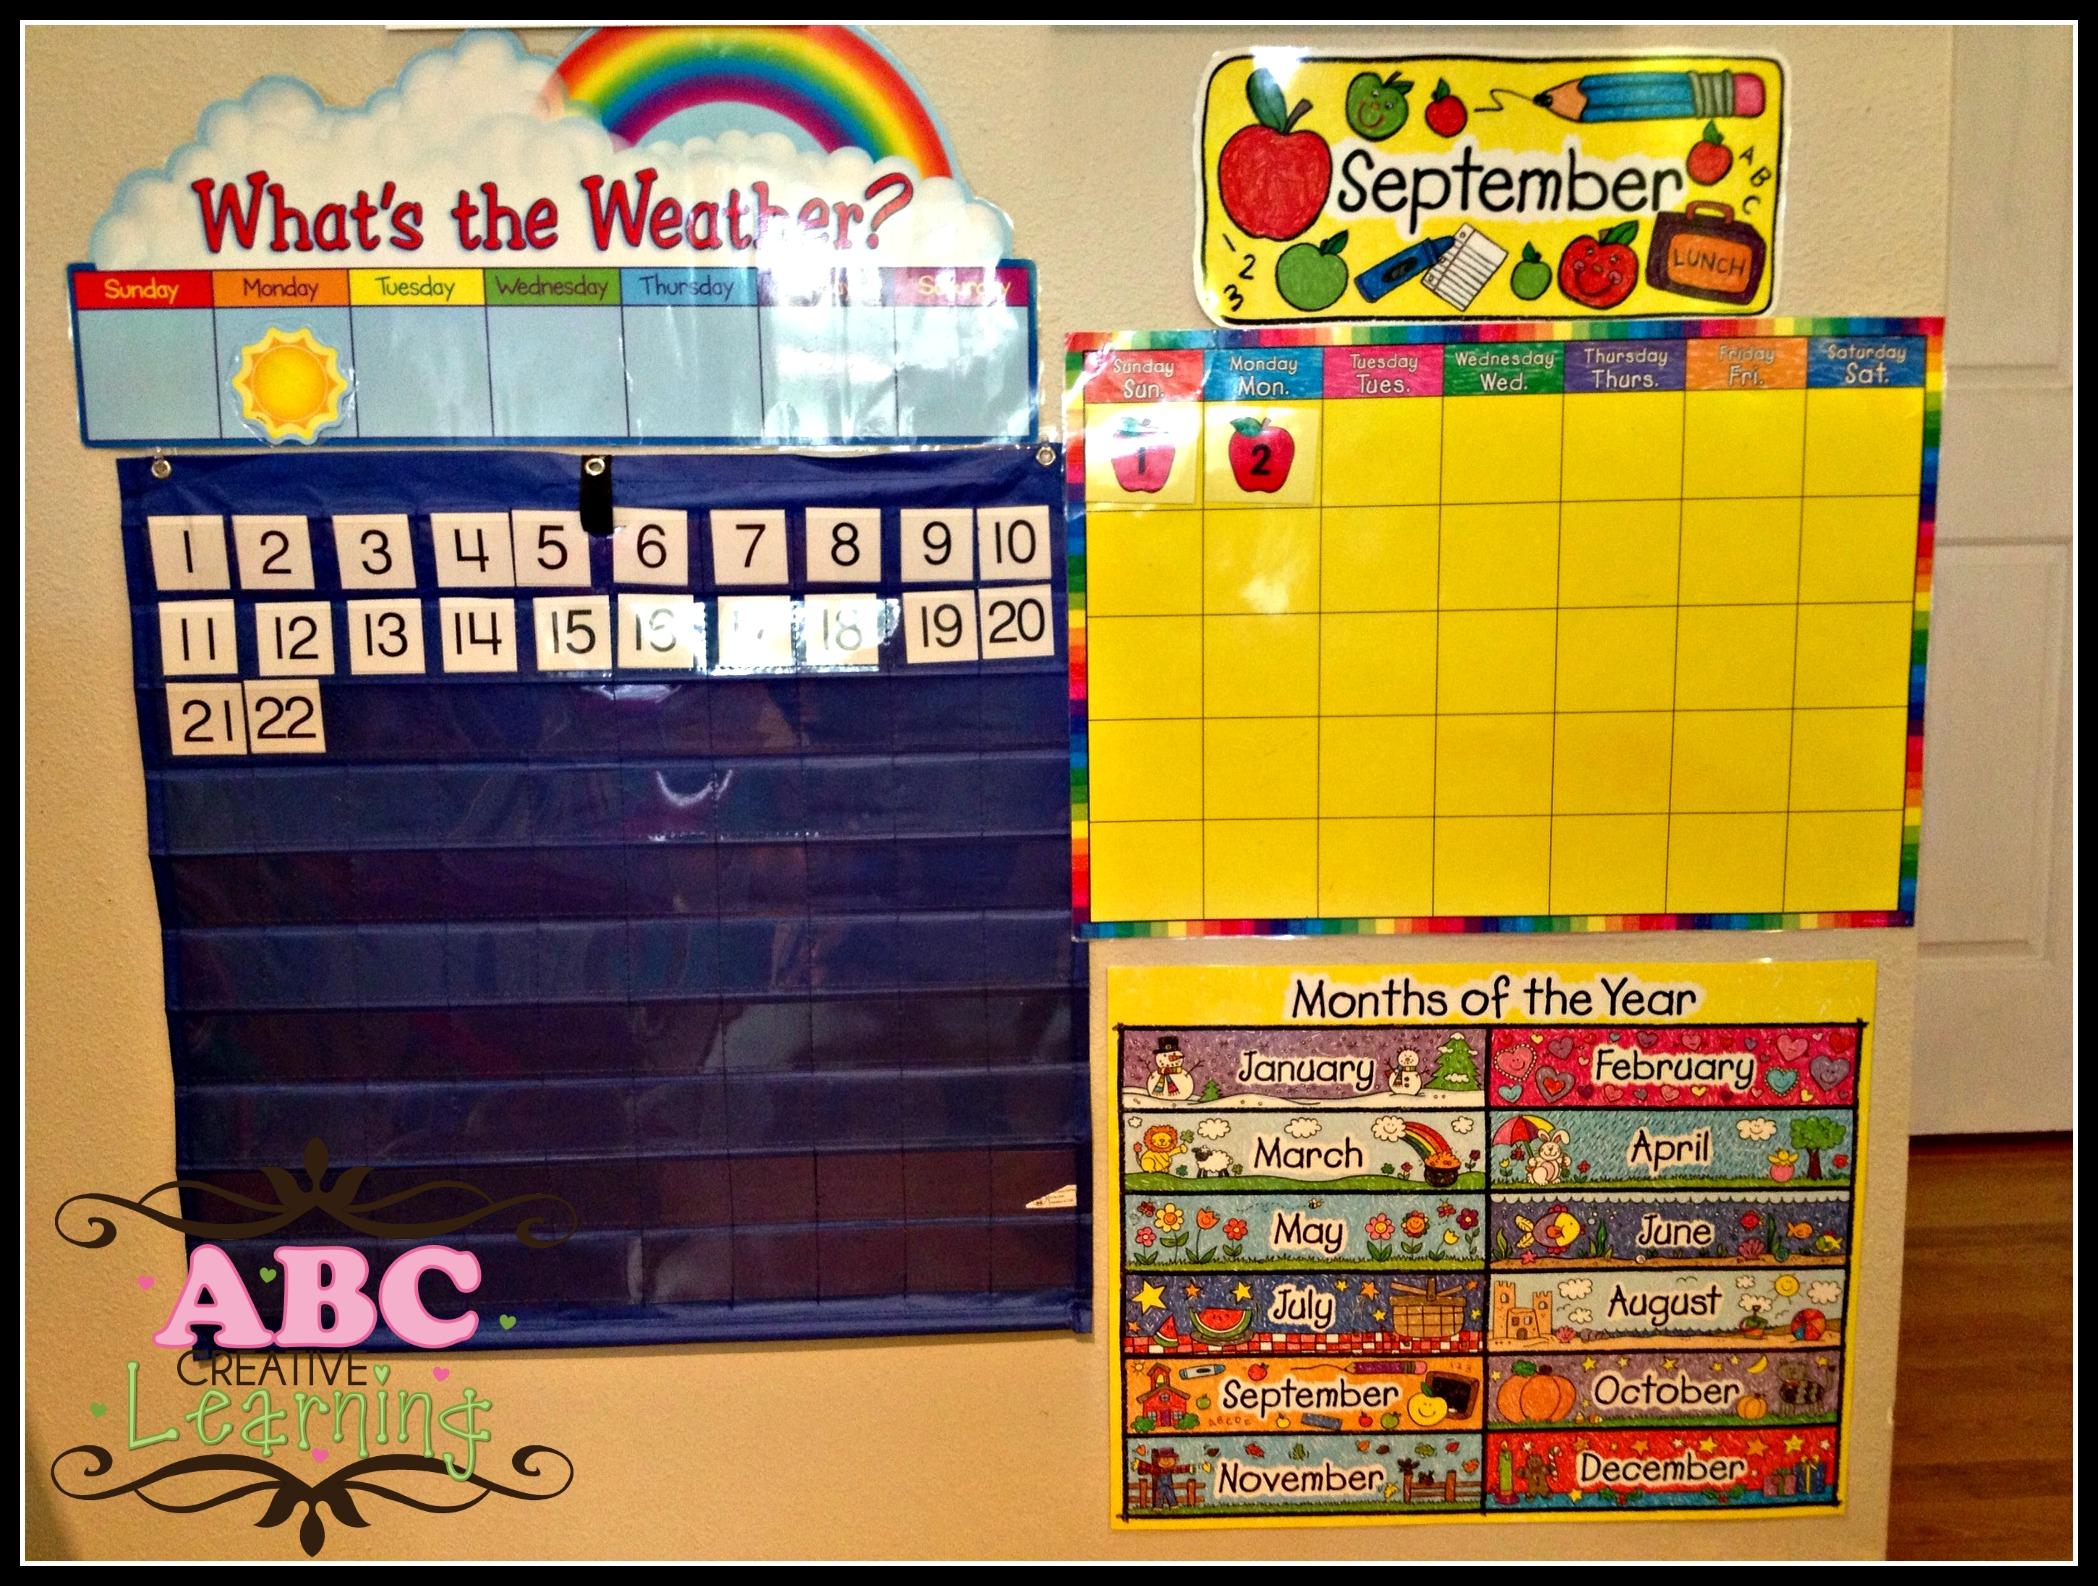 ABC Creative Learning Math Activ.